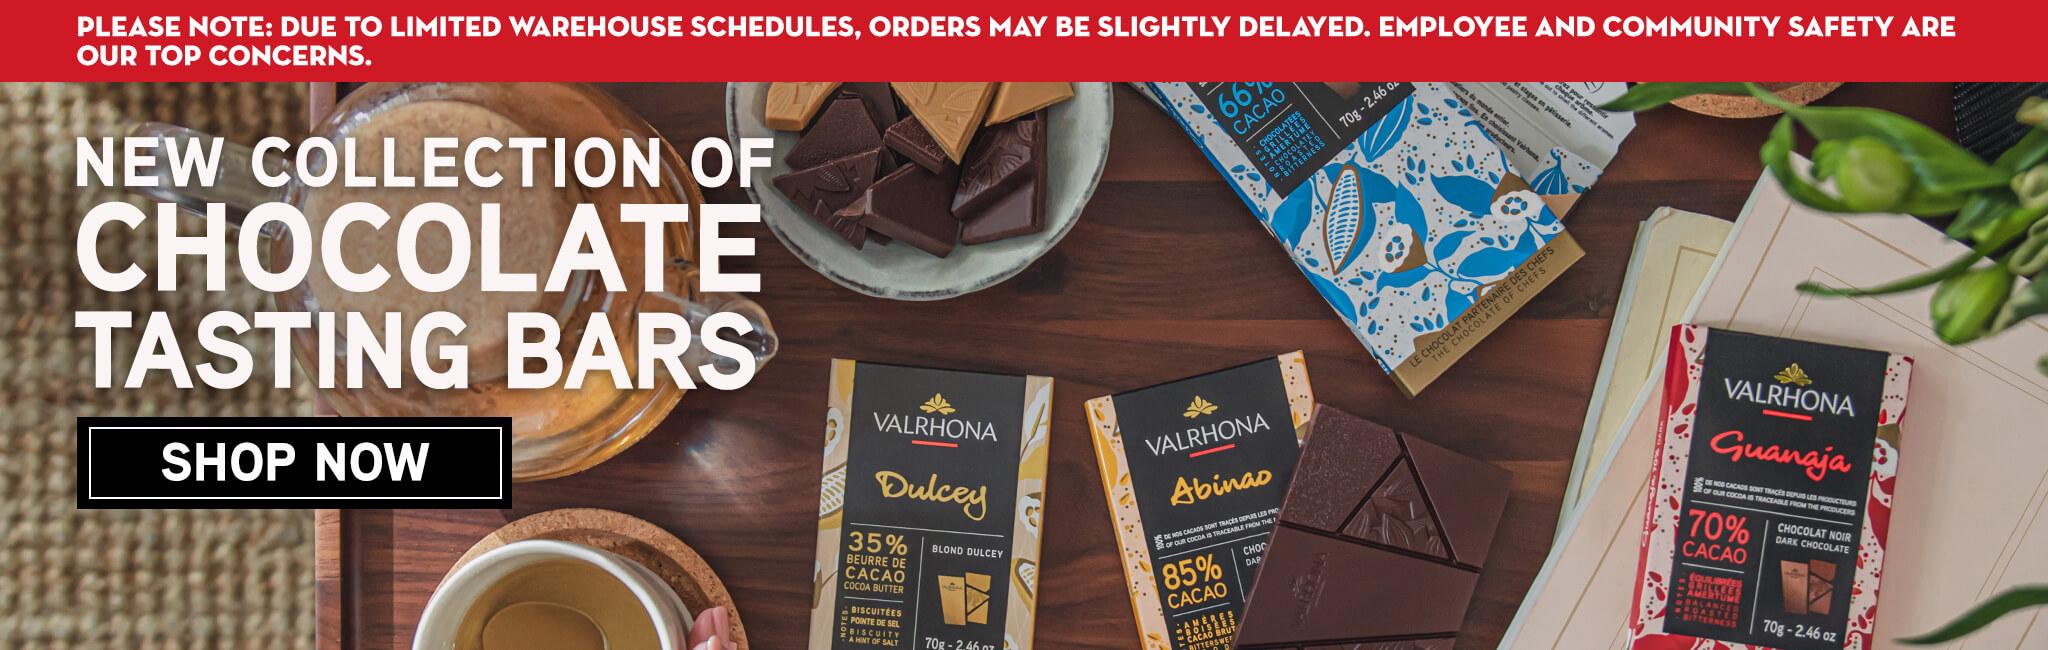 SHOP NEW CHOCOLATE TASTING BARS